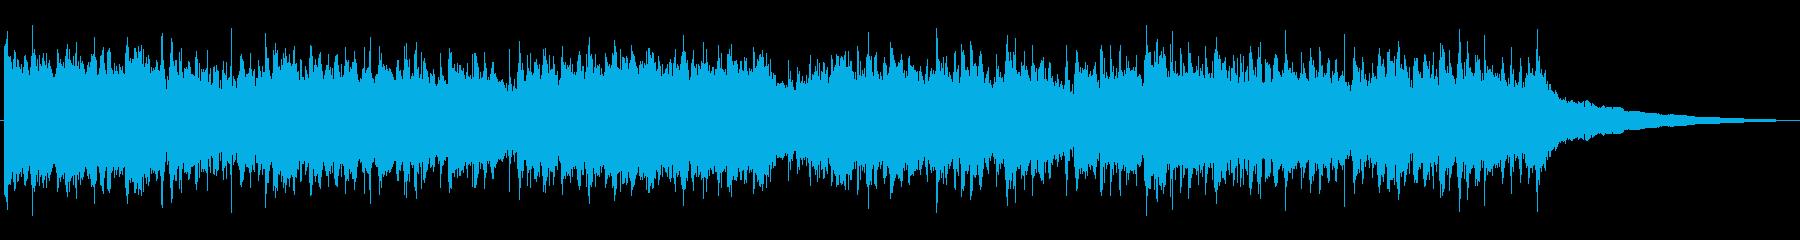 CM・情熱的でかっこいいフラメンコ28秒の再生済みの波形